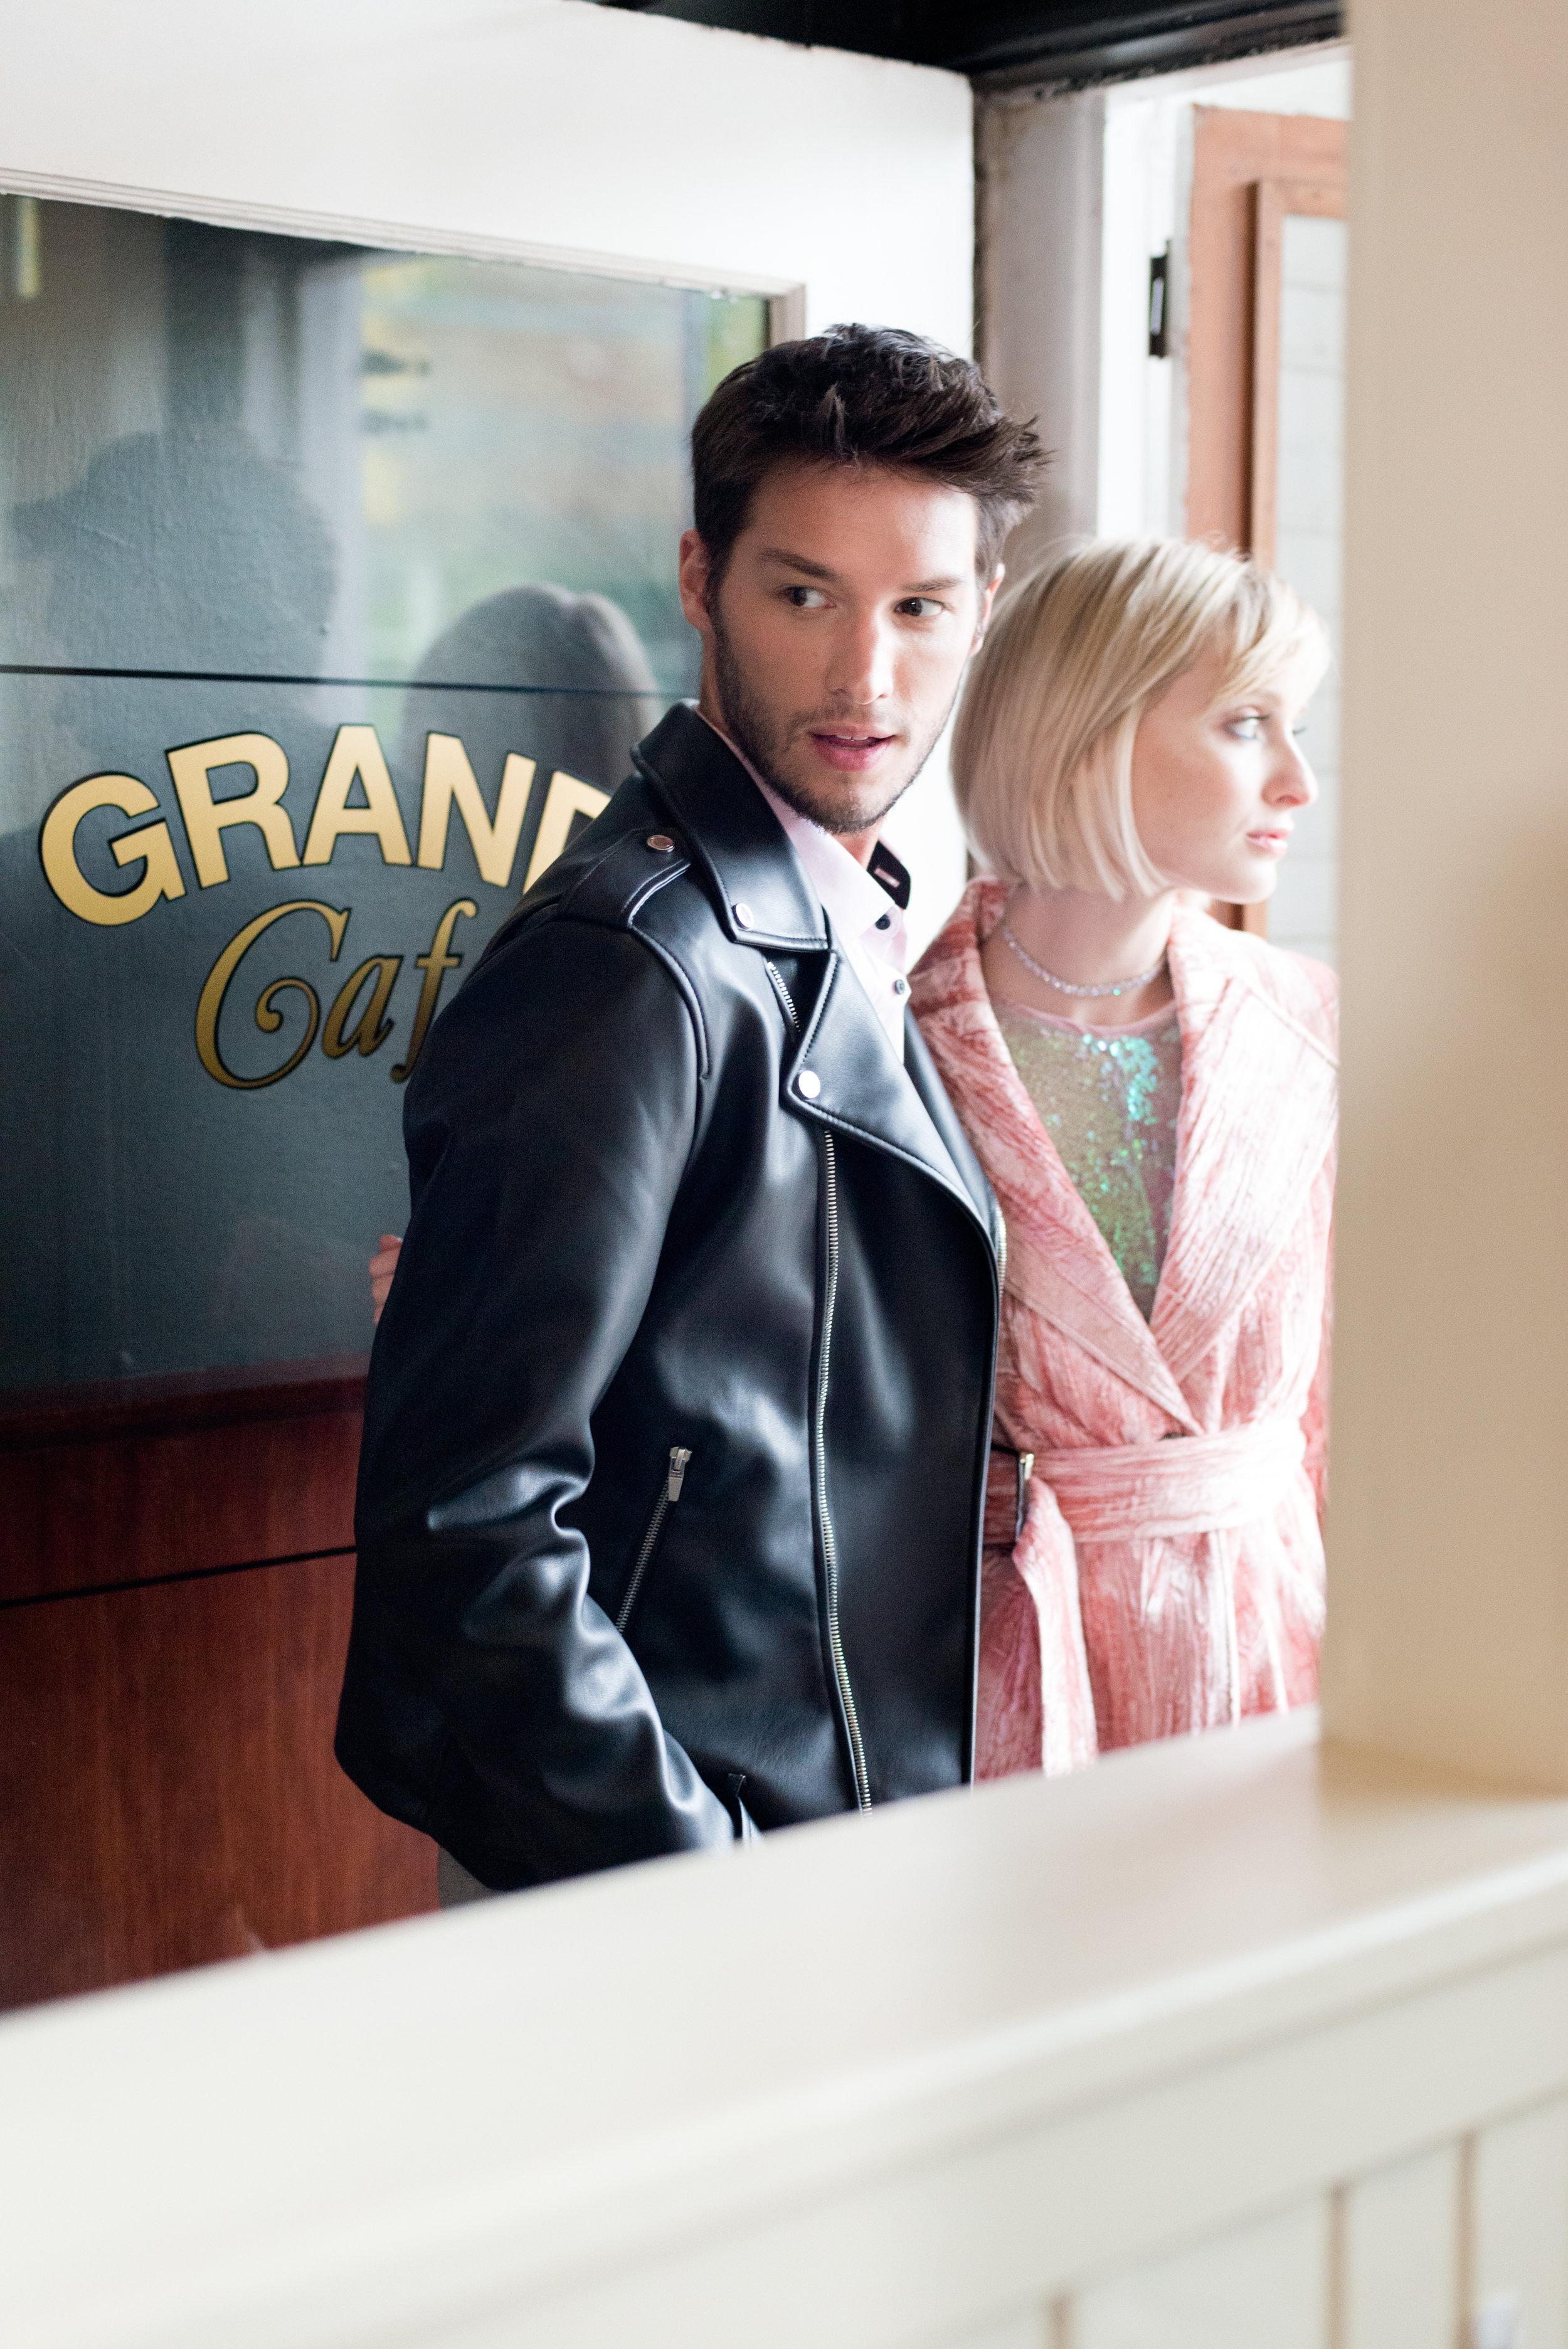 GrandCafeShoot-0366.JPG